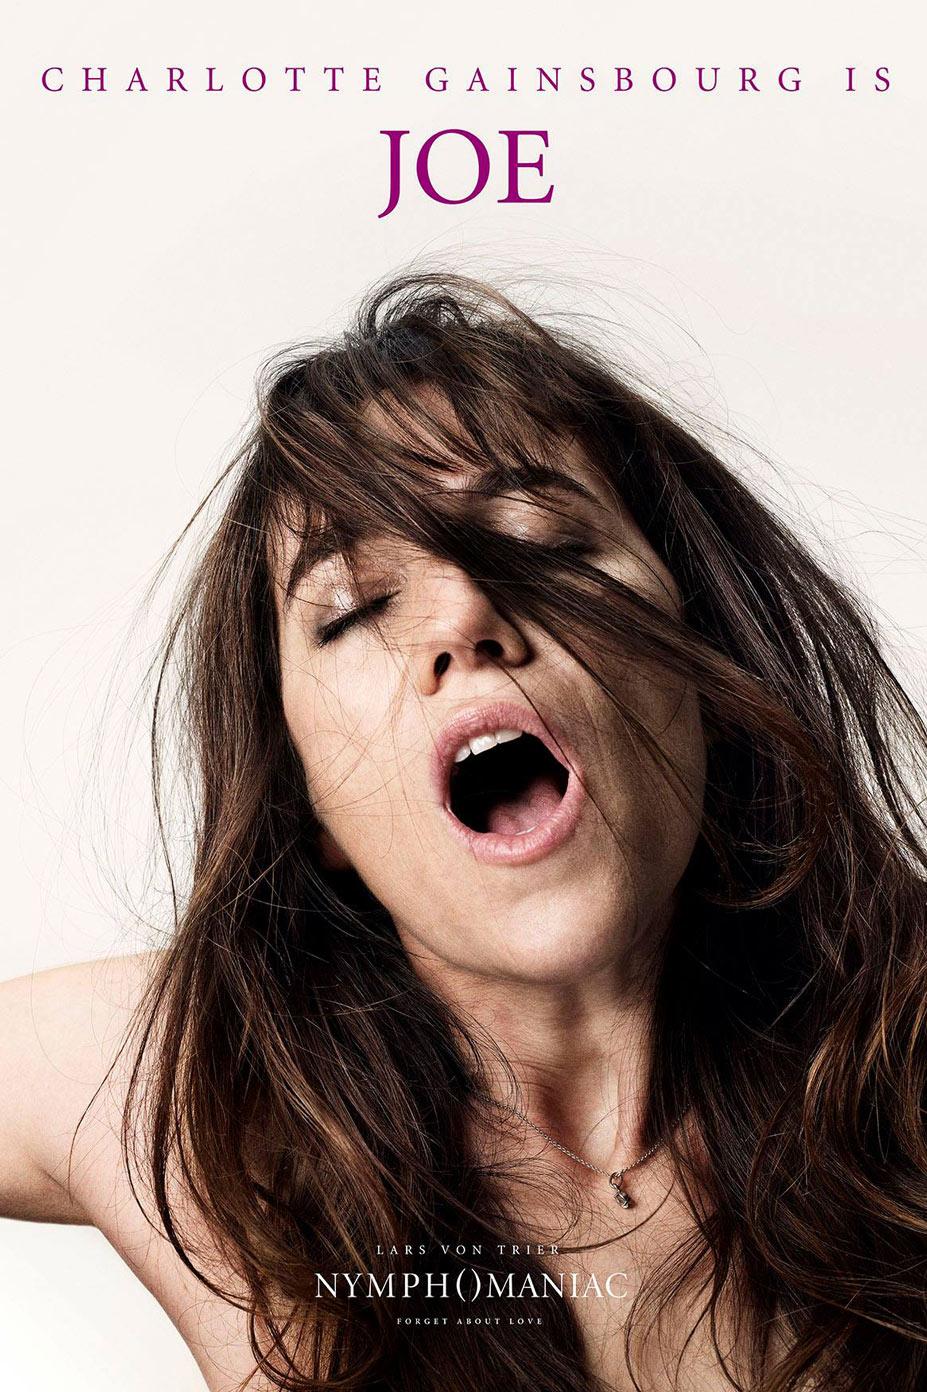 Постеры к фильму Нимфоманка / Nymphomaniac posters by Casper Sejersen - Charlotte Gainsbourg is Joe